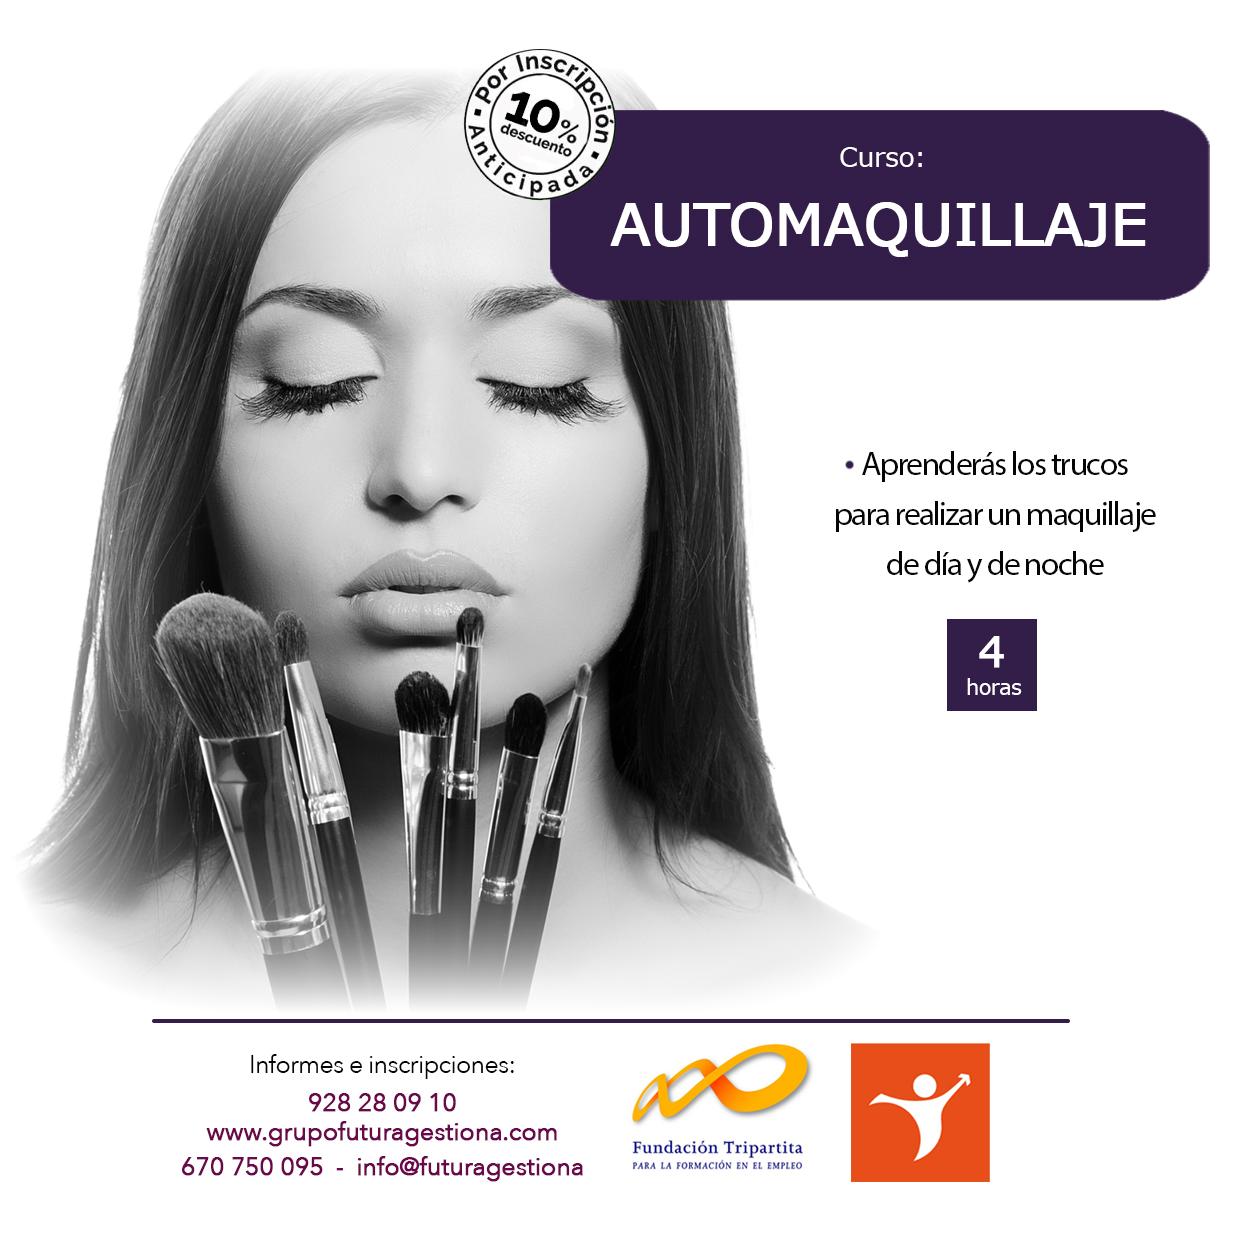 http://grupofuturagestiona.com/wp-content/uploads/2014/11/Curso-de-Automaquillaje.jpg